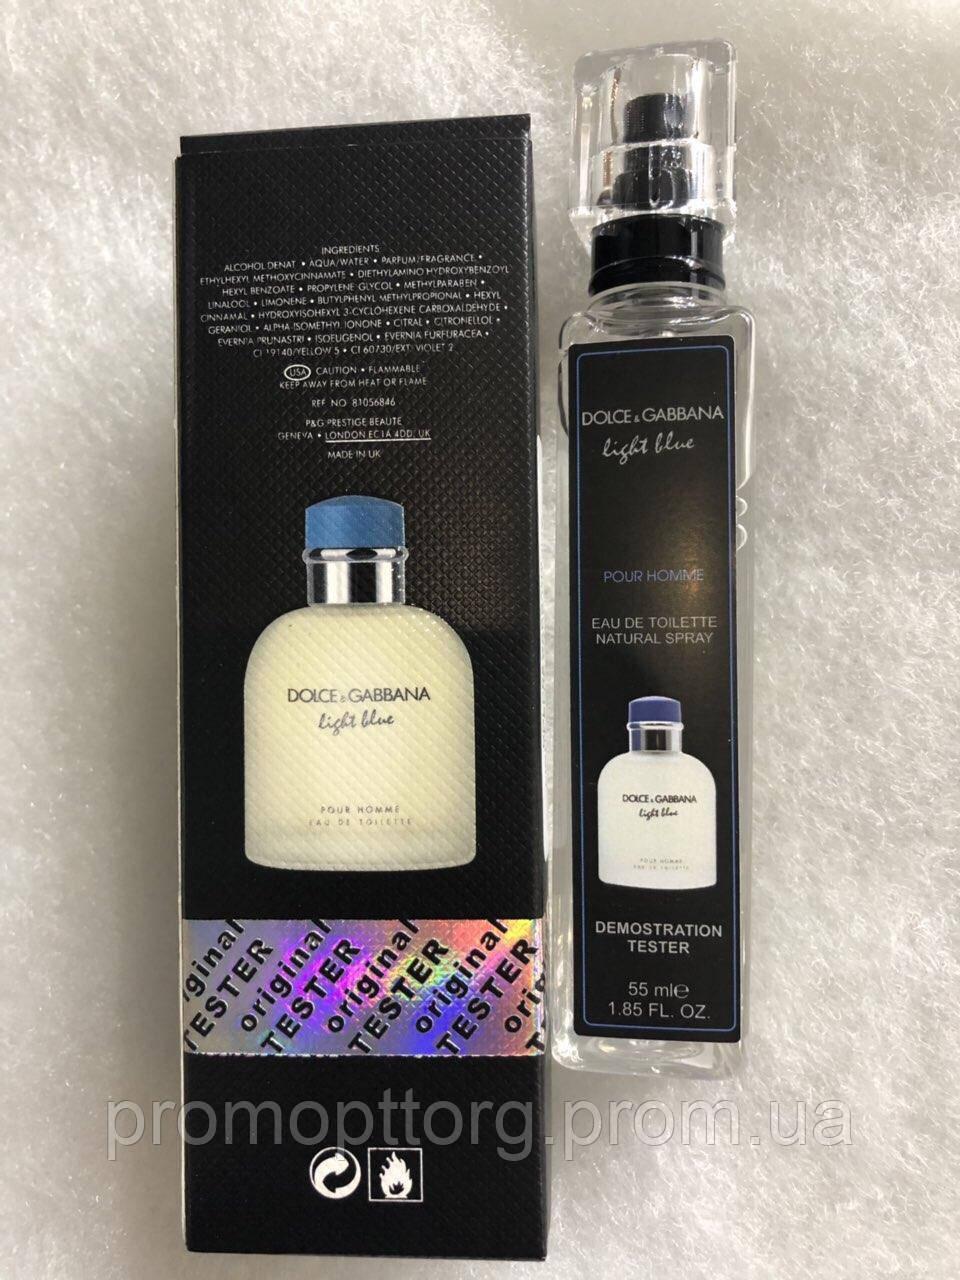 Парфюм мужской Light Blue Dolce Gabbana тестер 55 ml(реплика)